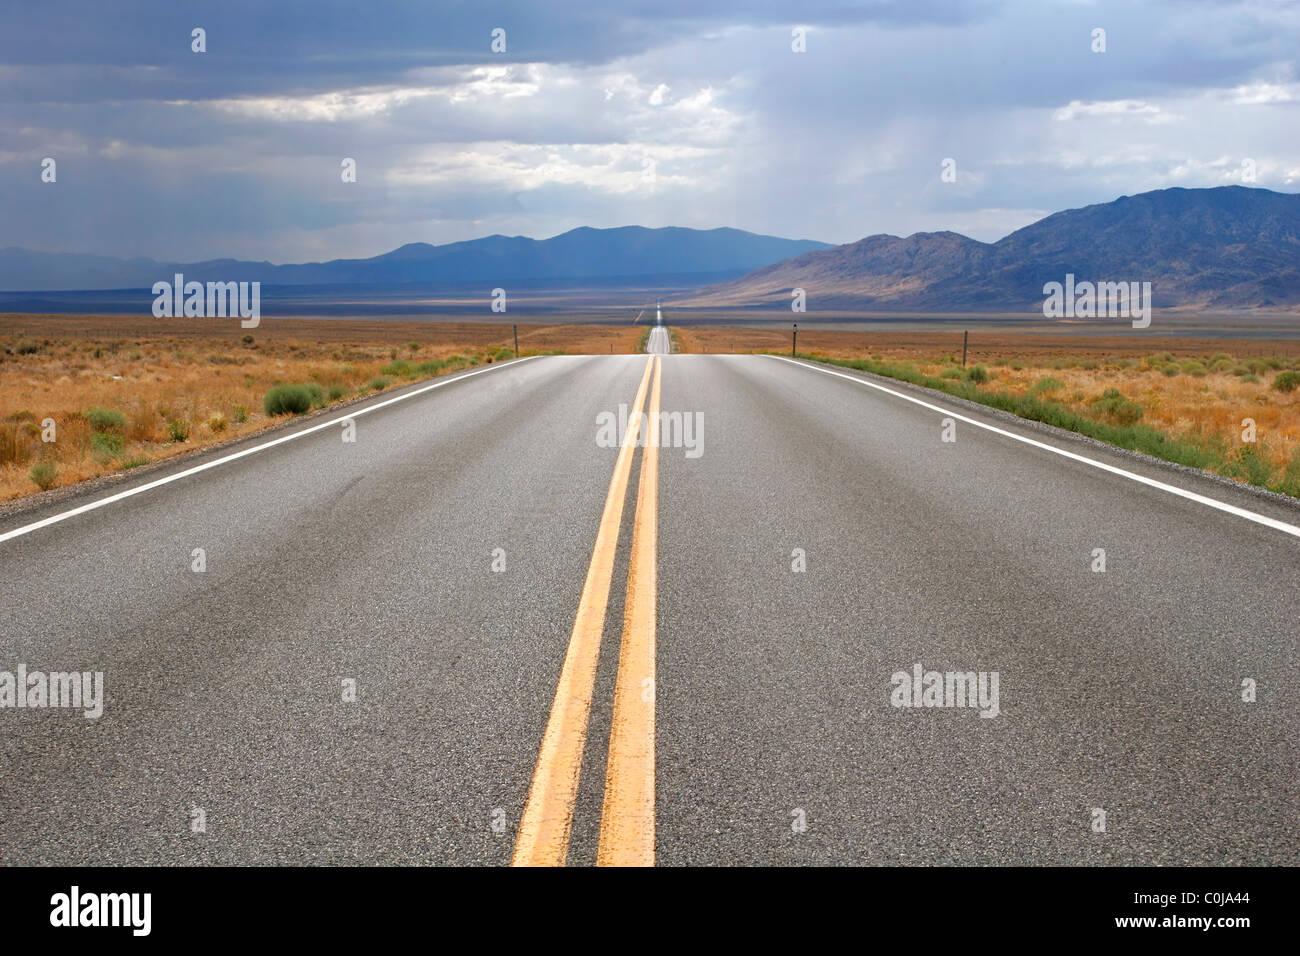 the-loneliest-road-in-america-us-50-in-n